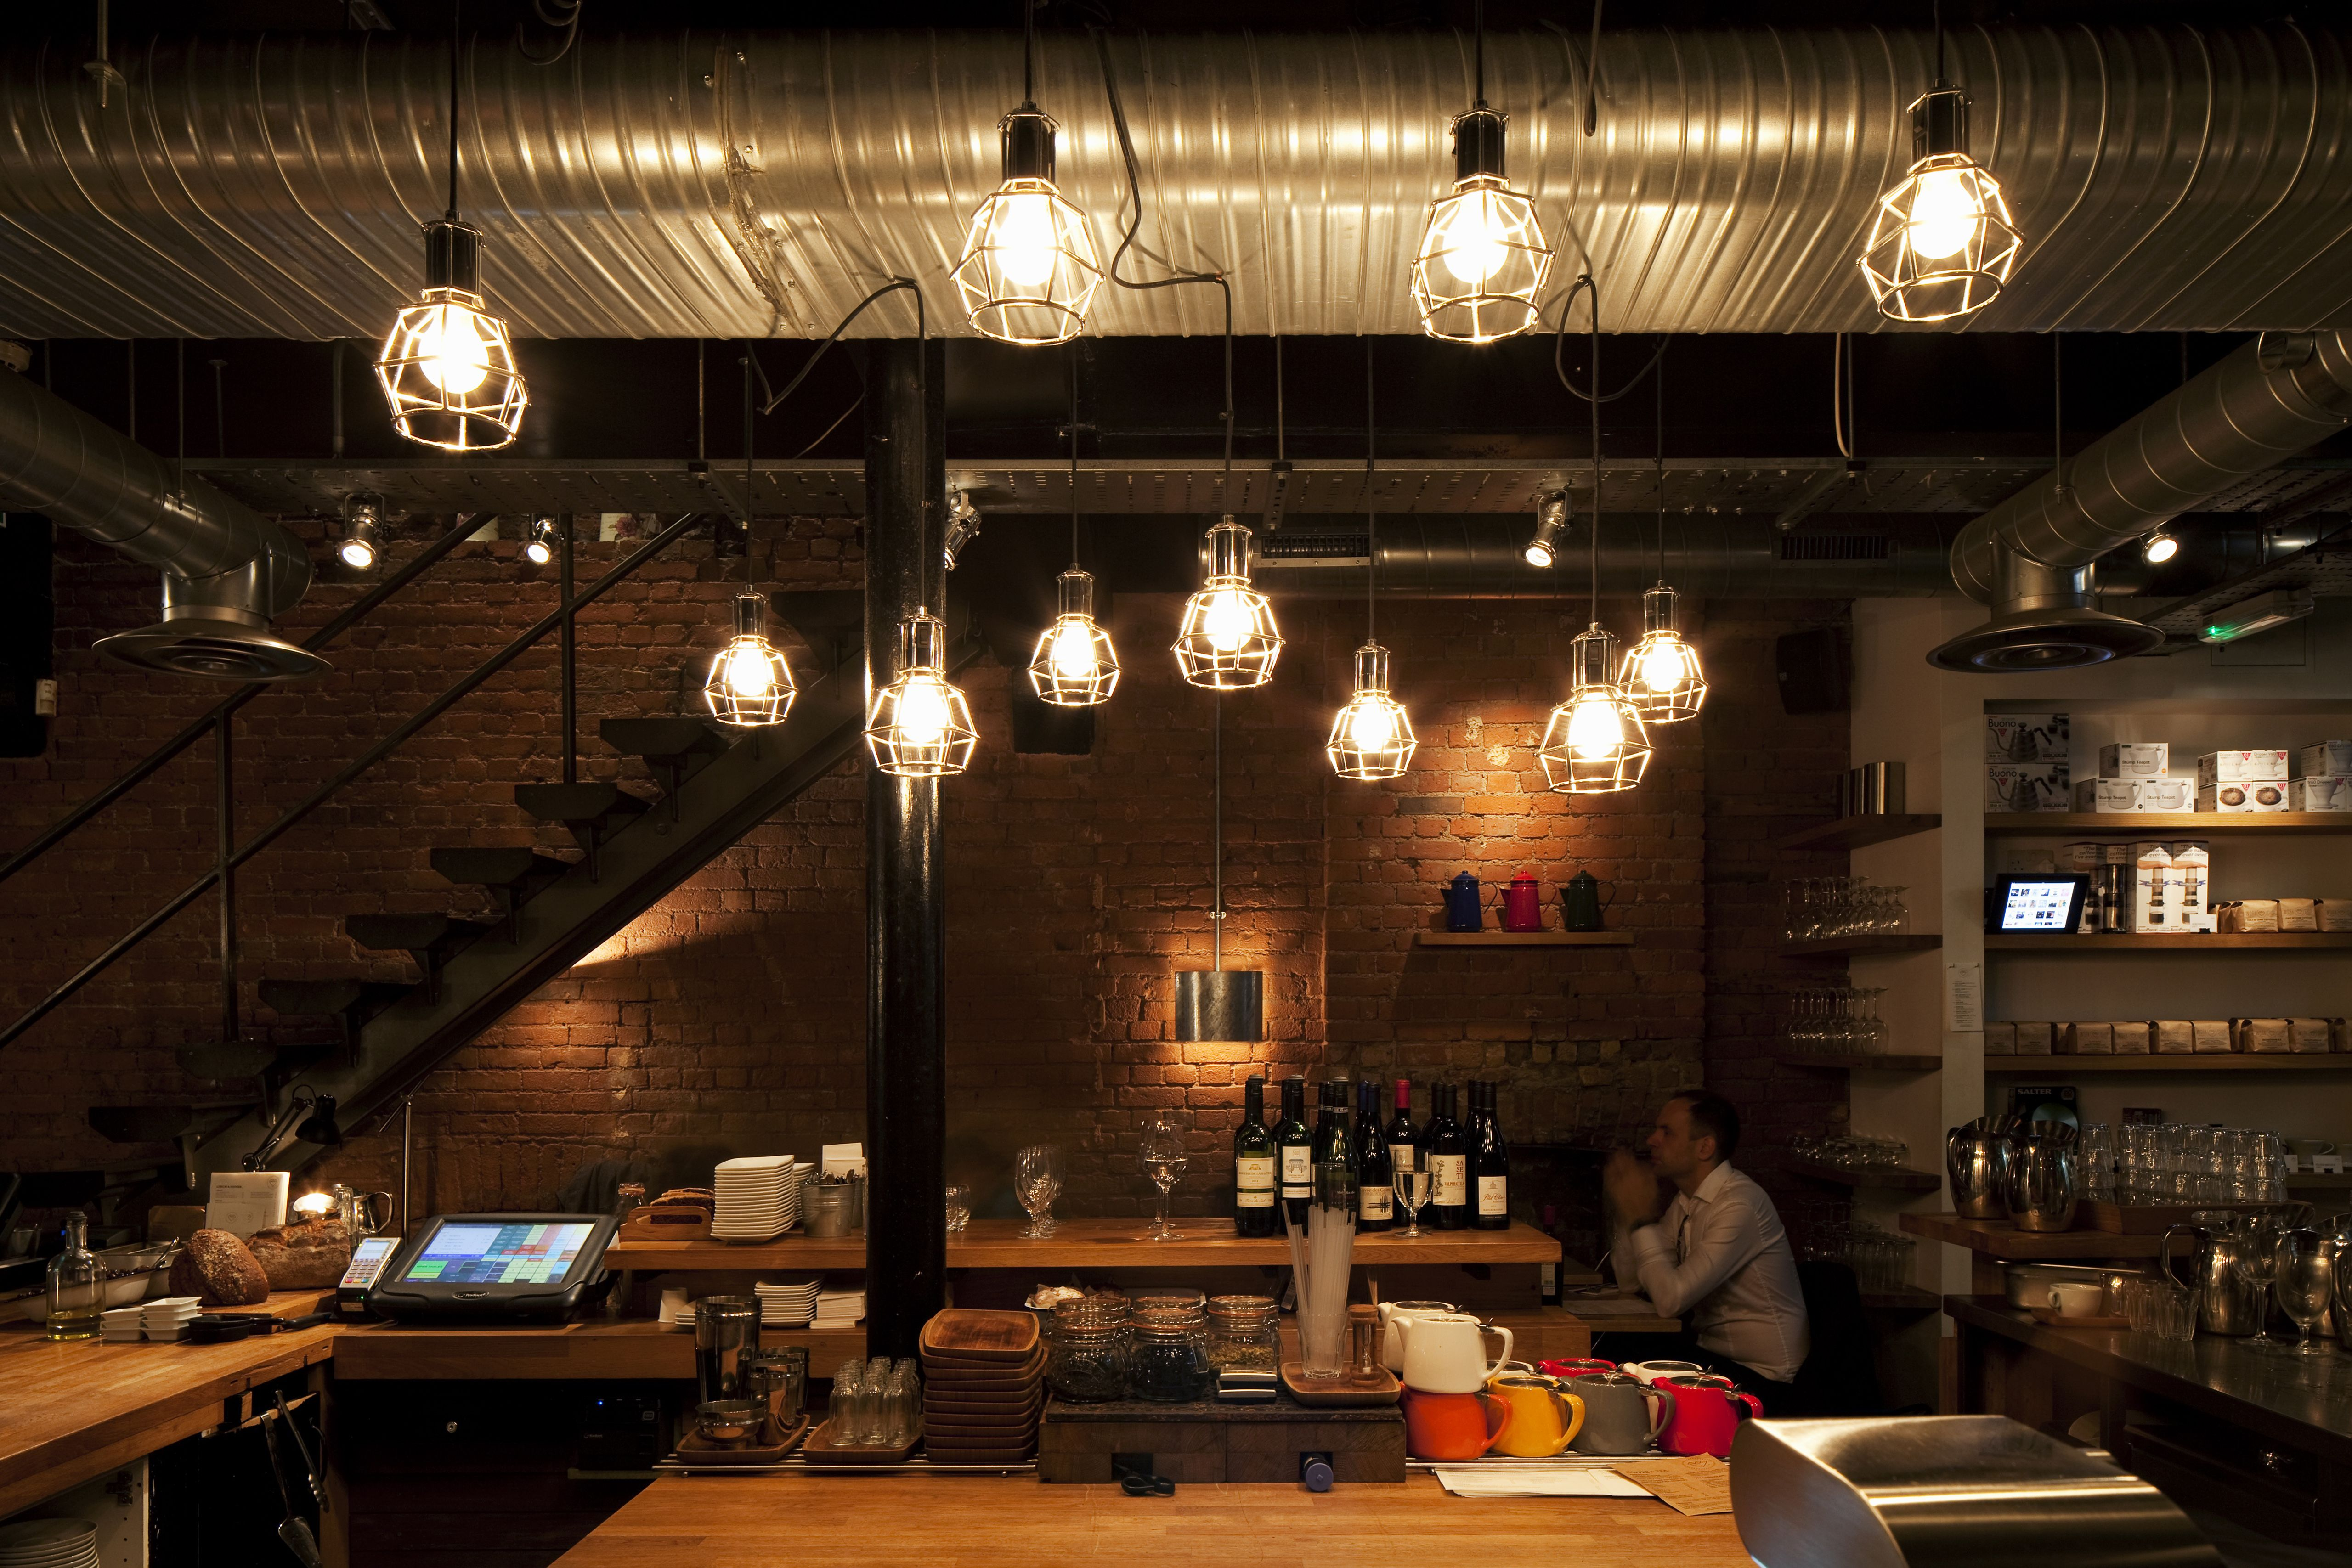 Beautiful restaurant lighting with a relaxing ambience lighting led indoorlights decor pendantlights spotlights ambience illumination cafe